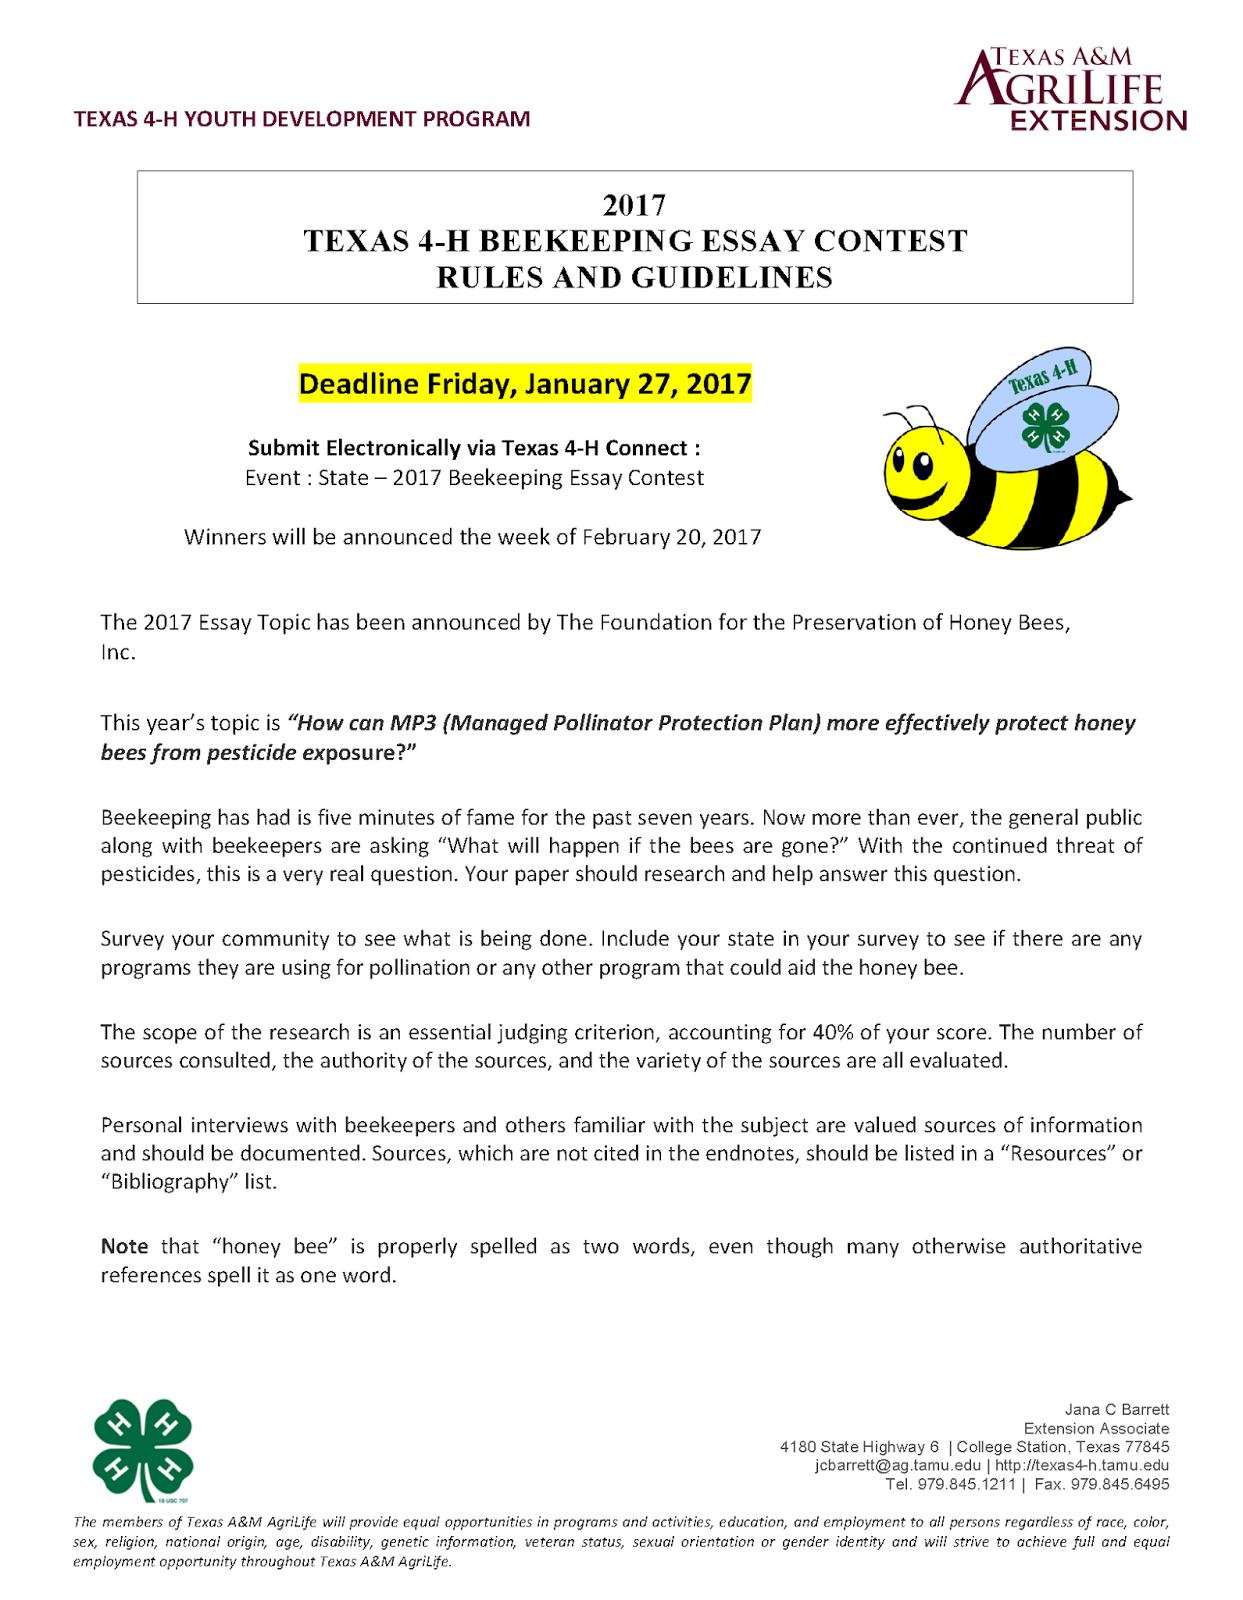 Admission essay writing contest